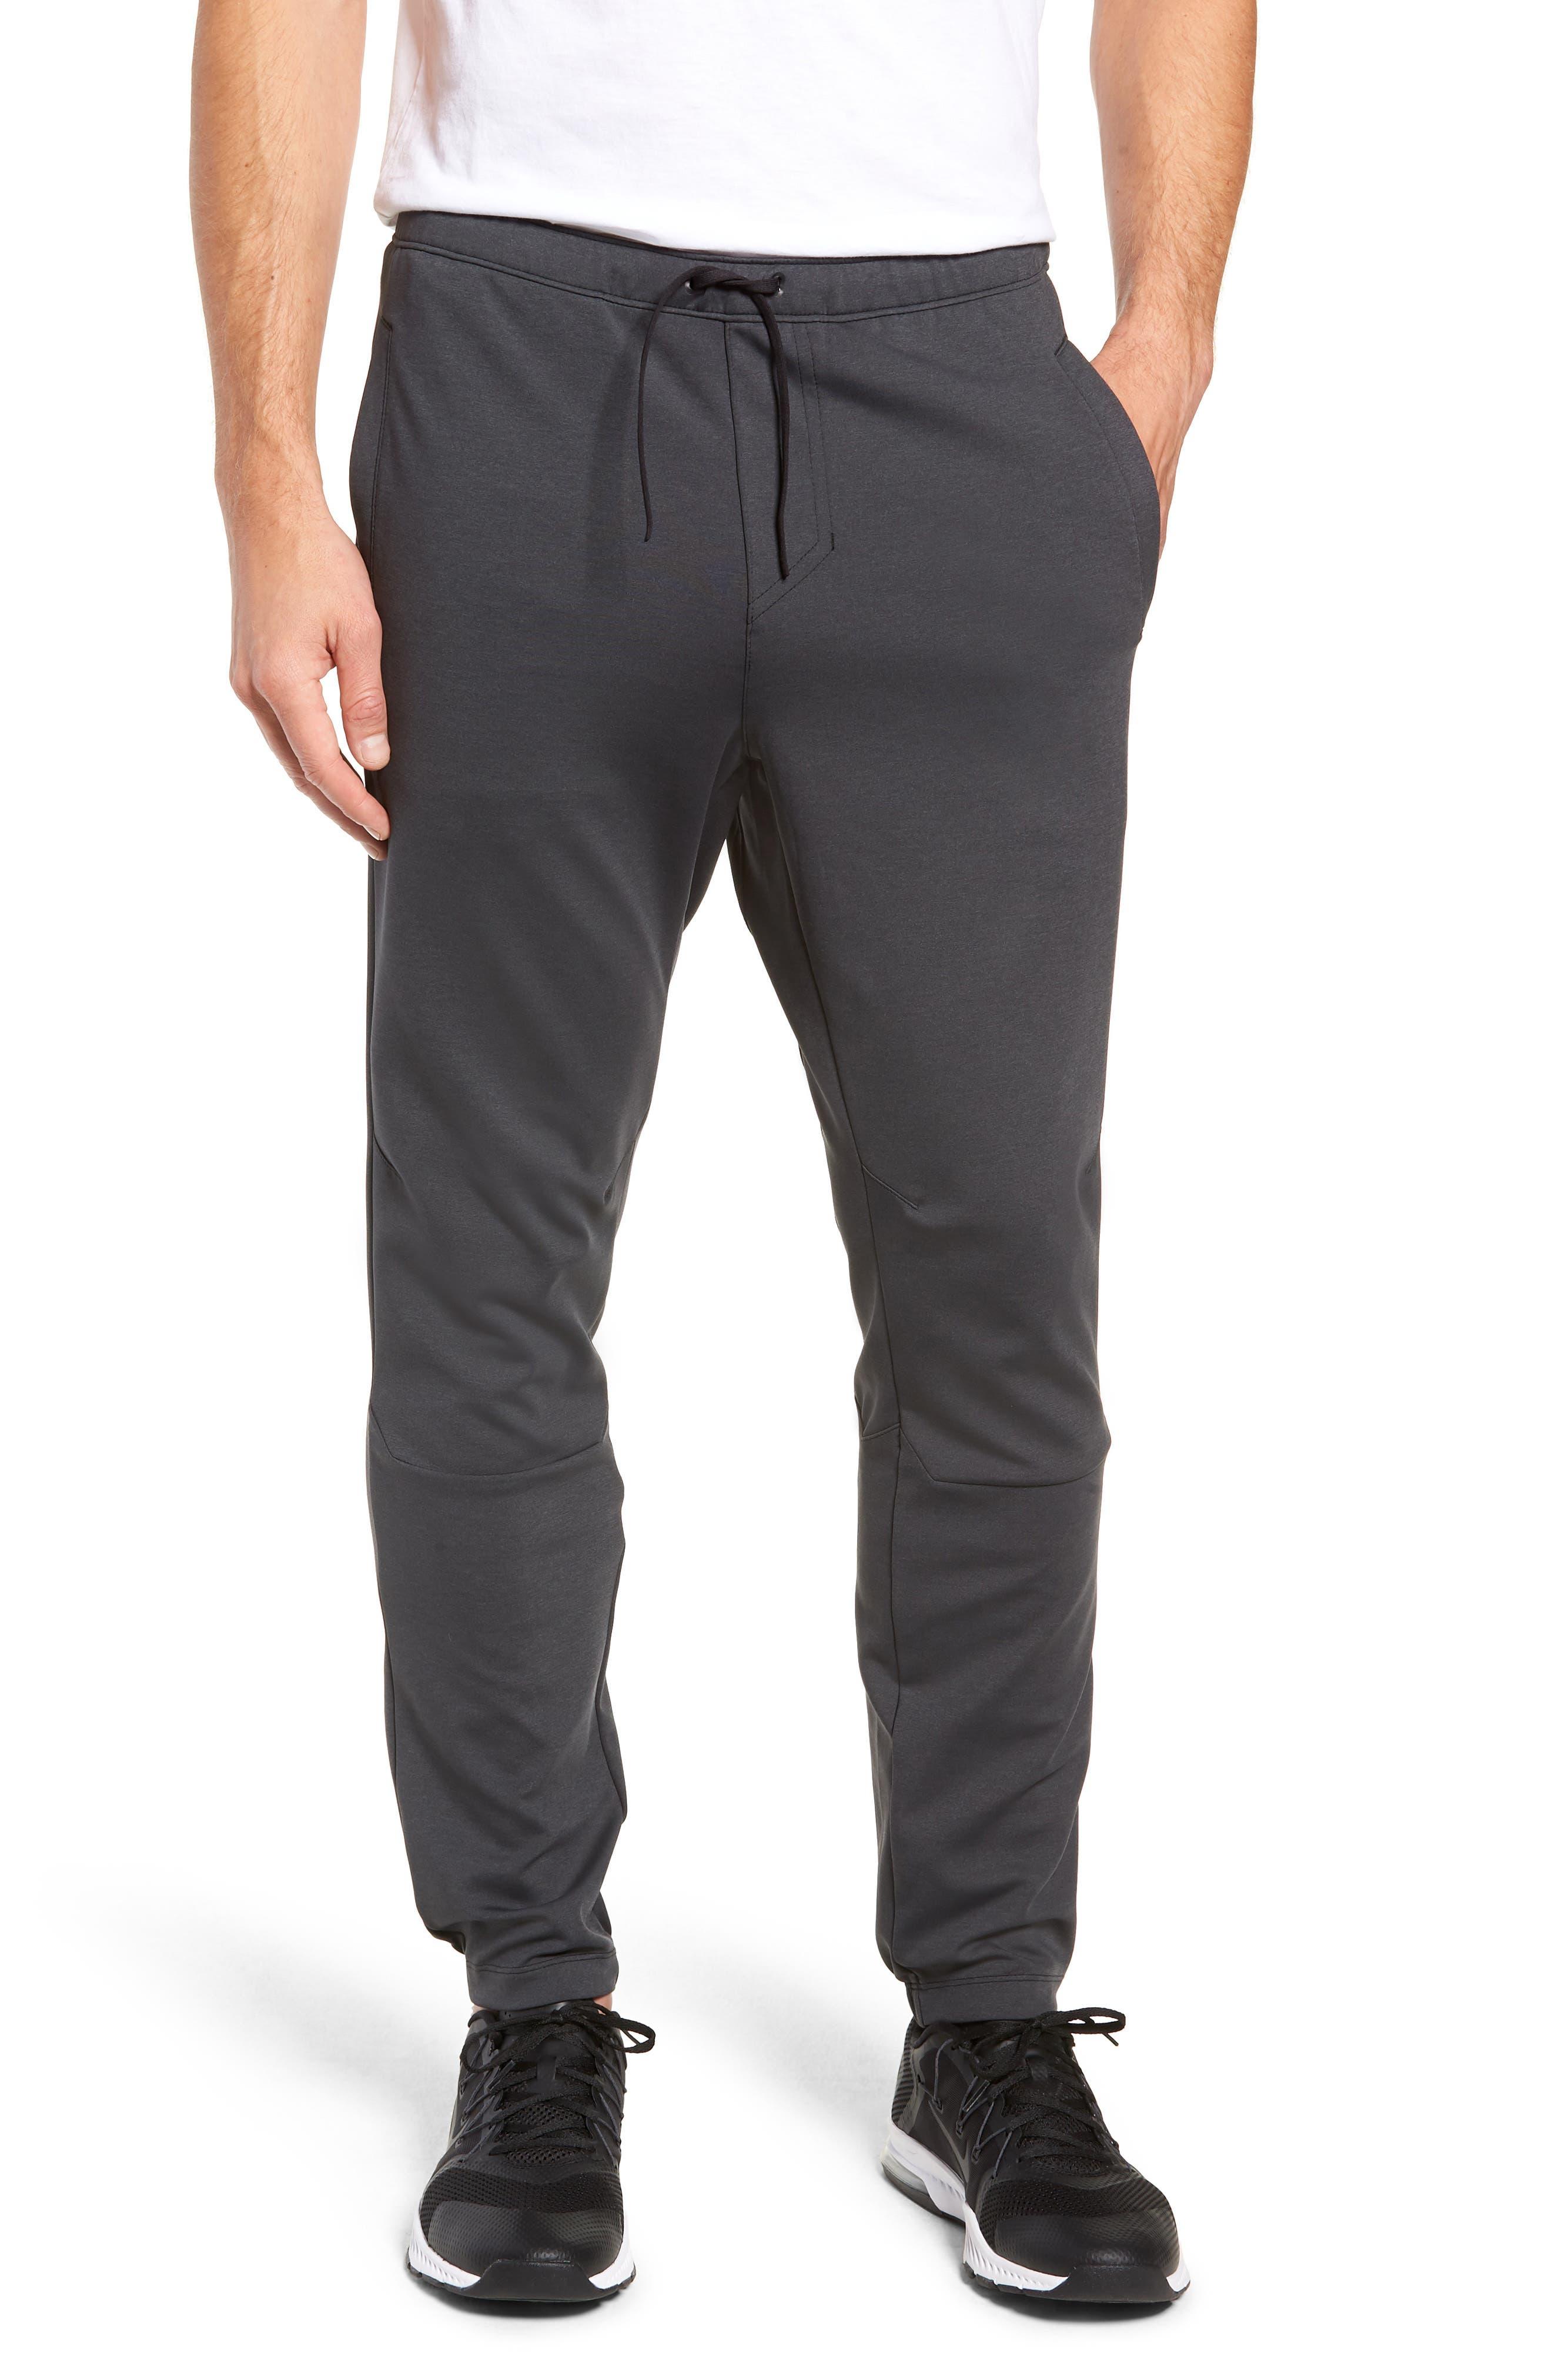 Rhone Tactel Nylon Sweatpants, Black